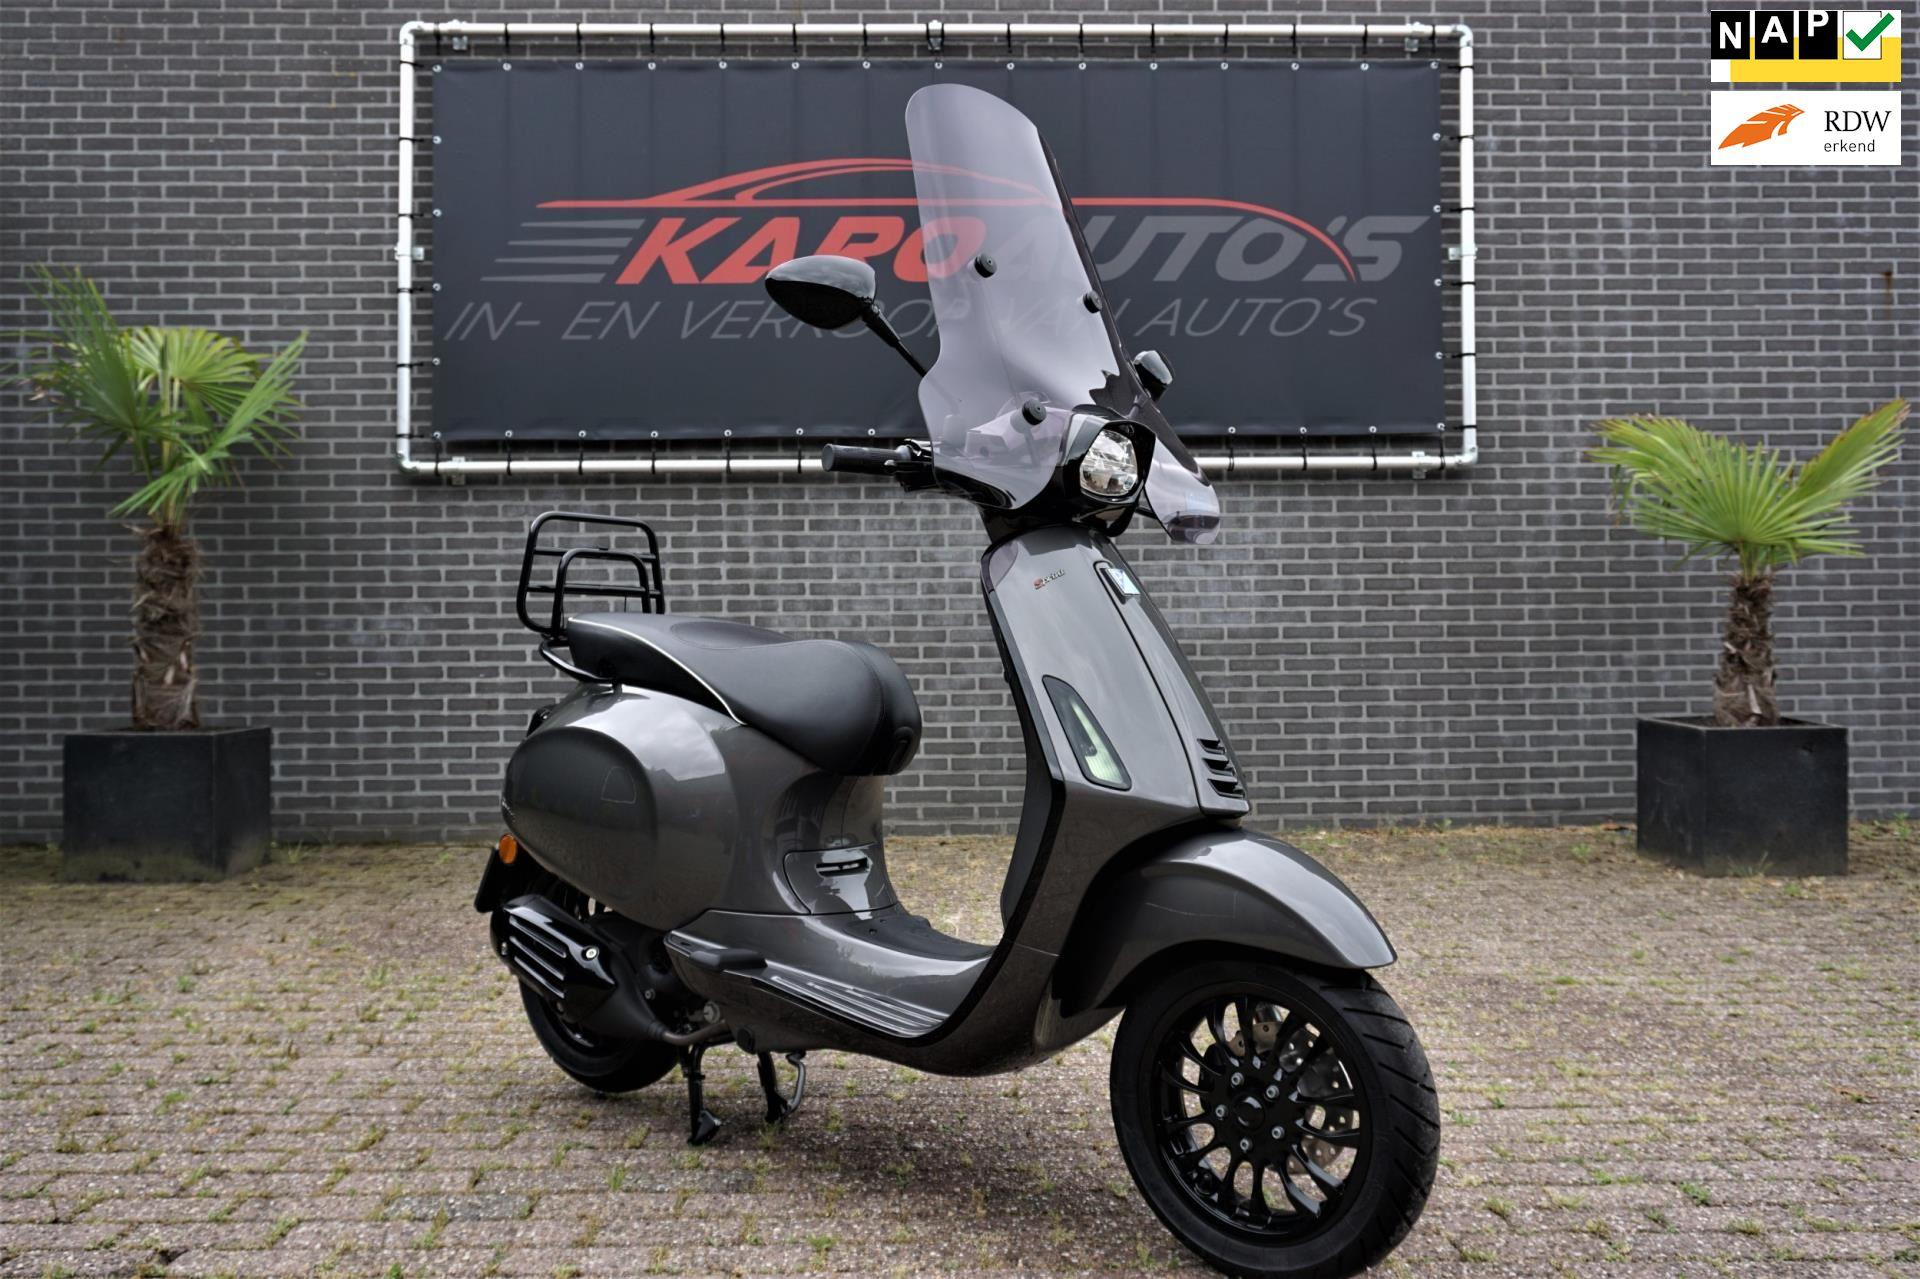 Vespa Sprint 4T Notte i-Get Custom 12-2020 314km GPS  Slot occasion - KARO Auto's